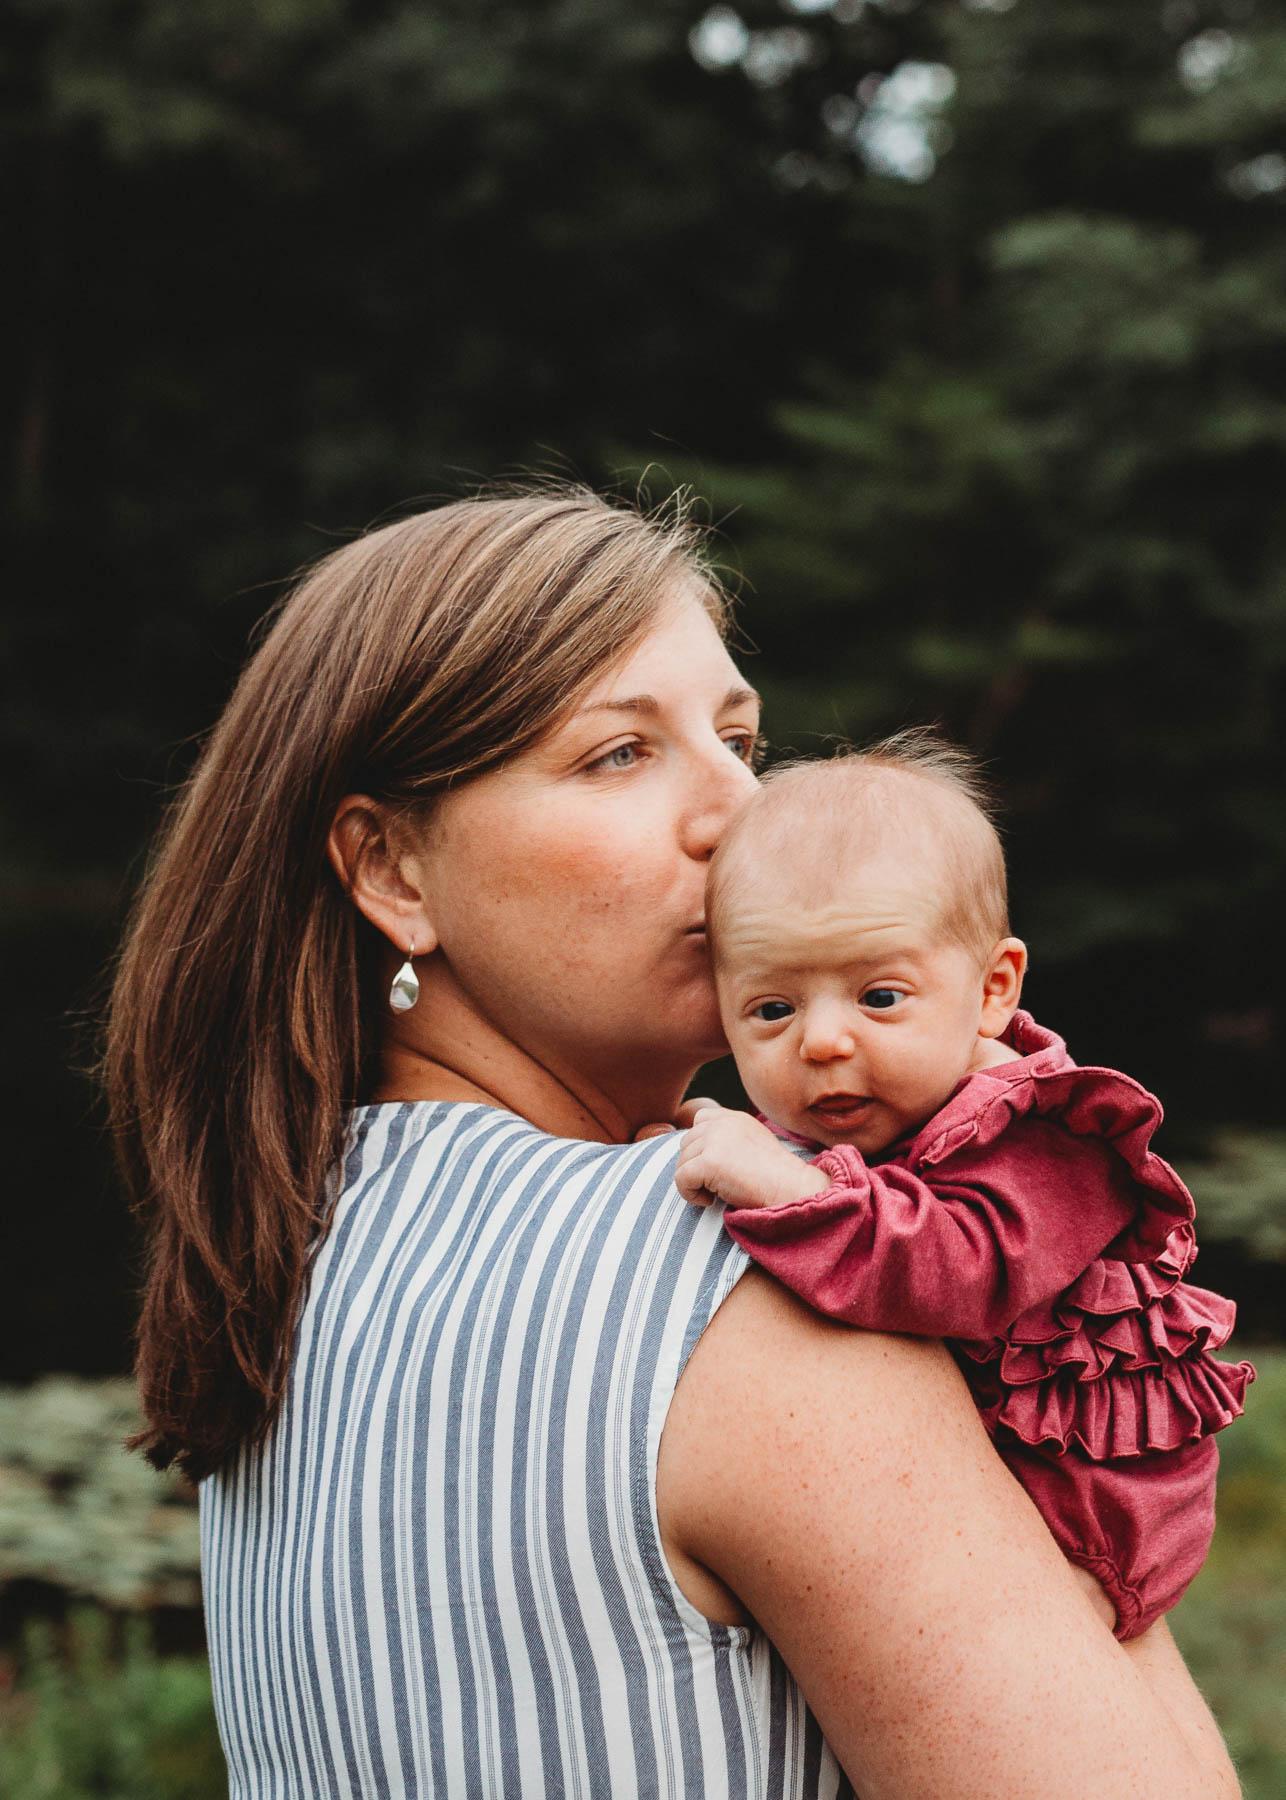 Sweet moments with Sudbury, Massachusetts family's newborn photo session. Indoor and outdoor session in Greater Boston. Boston family photographer Joy LeDuc.